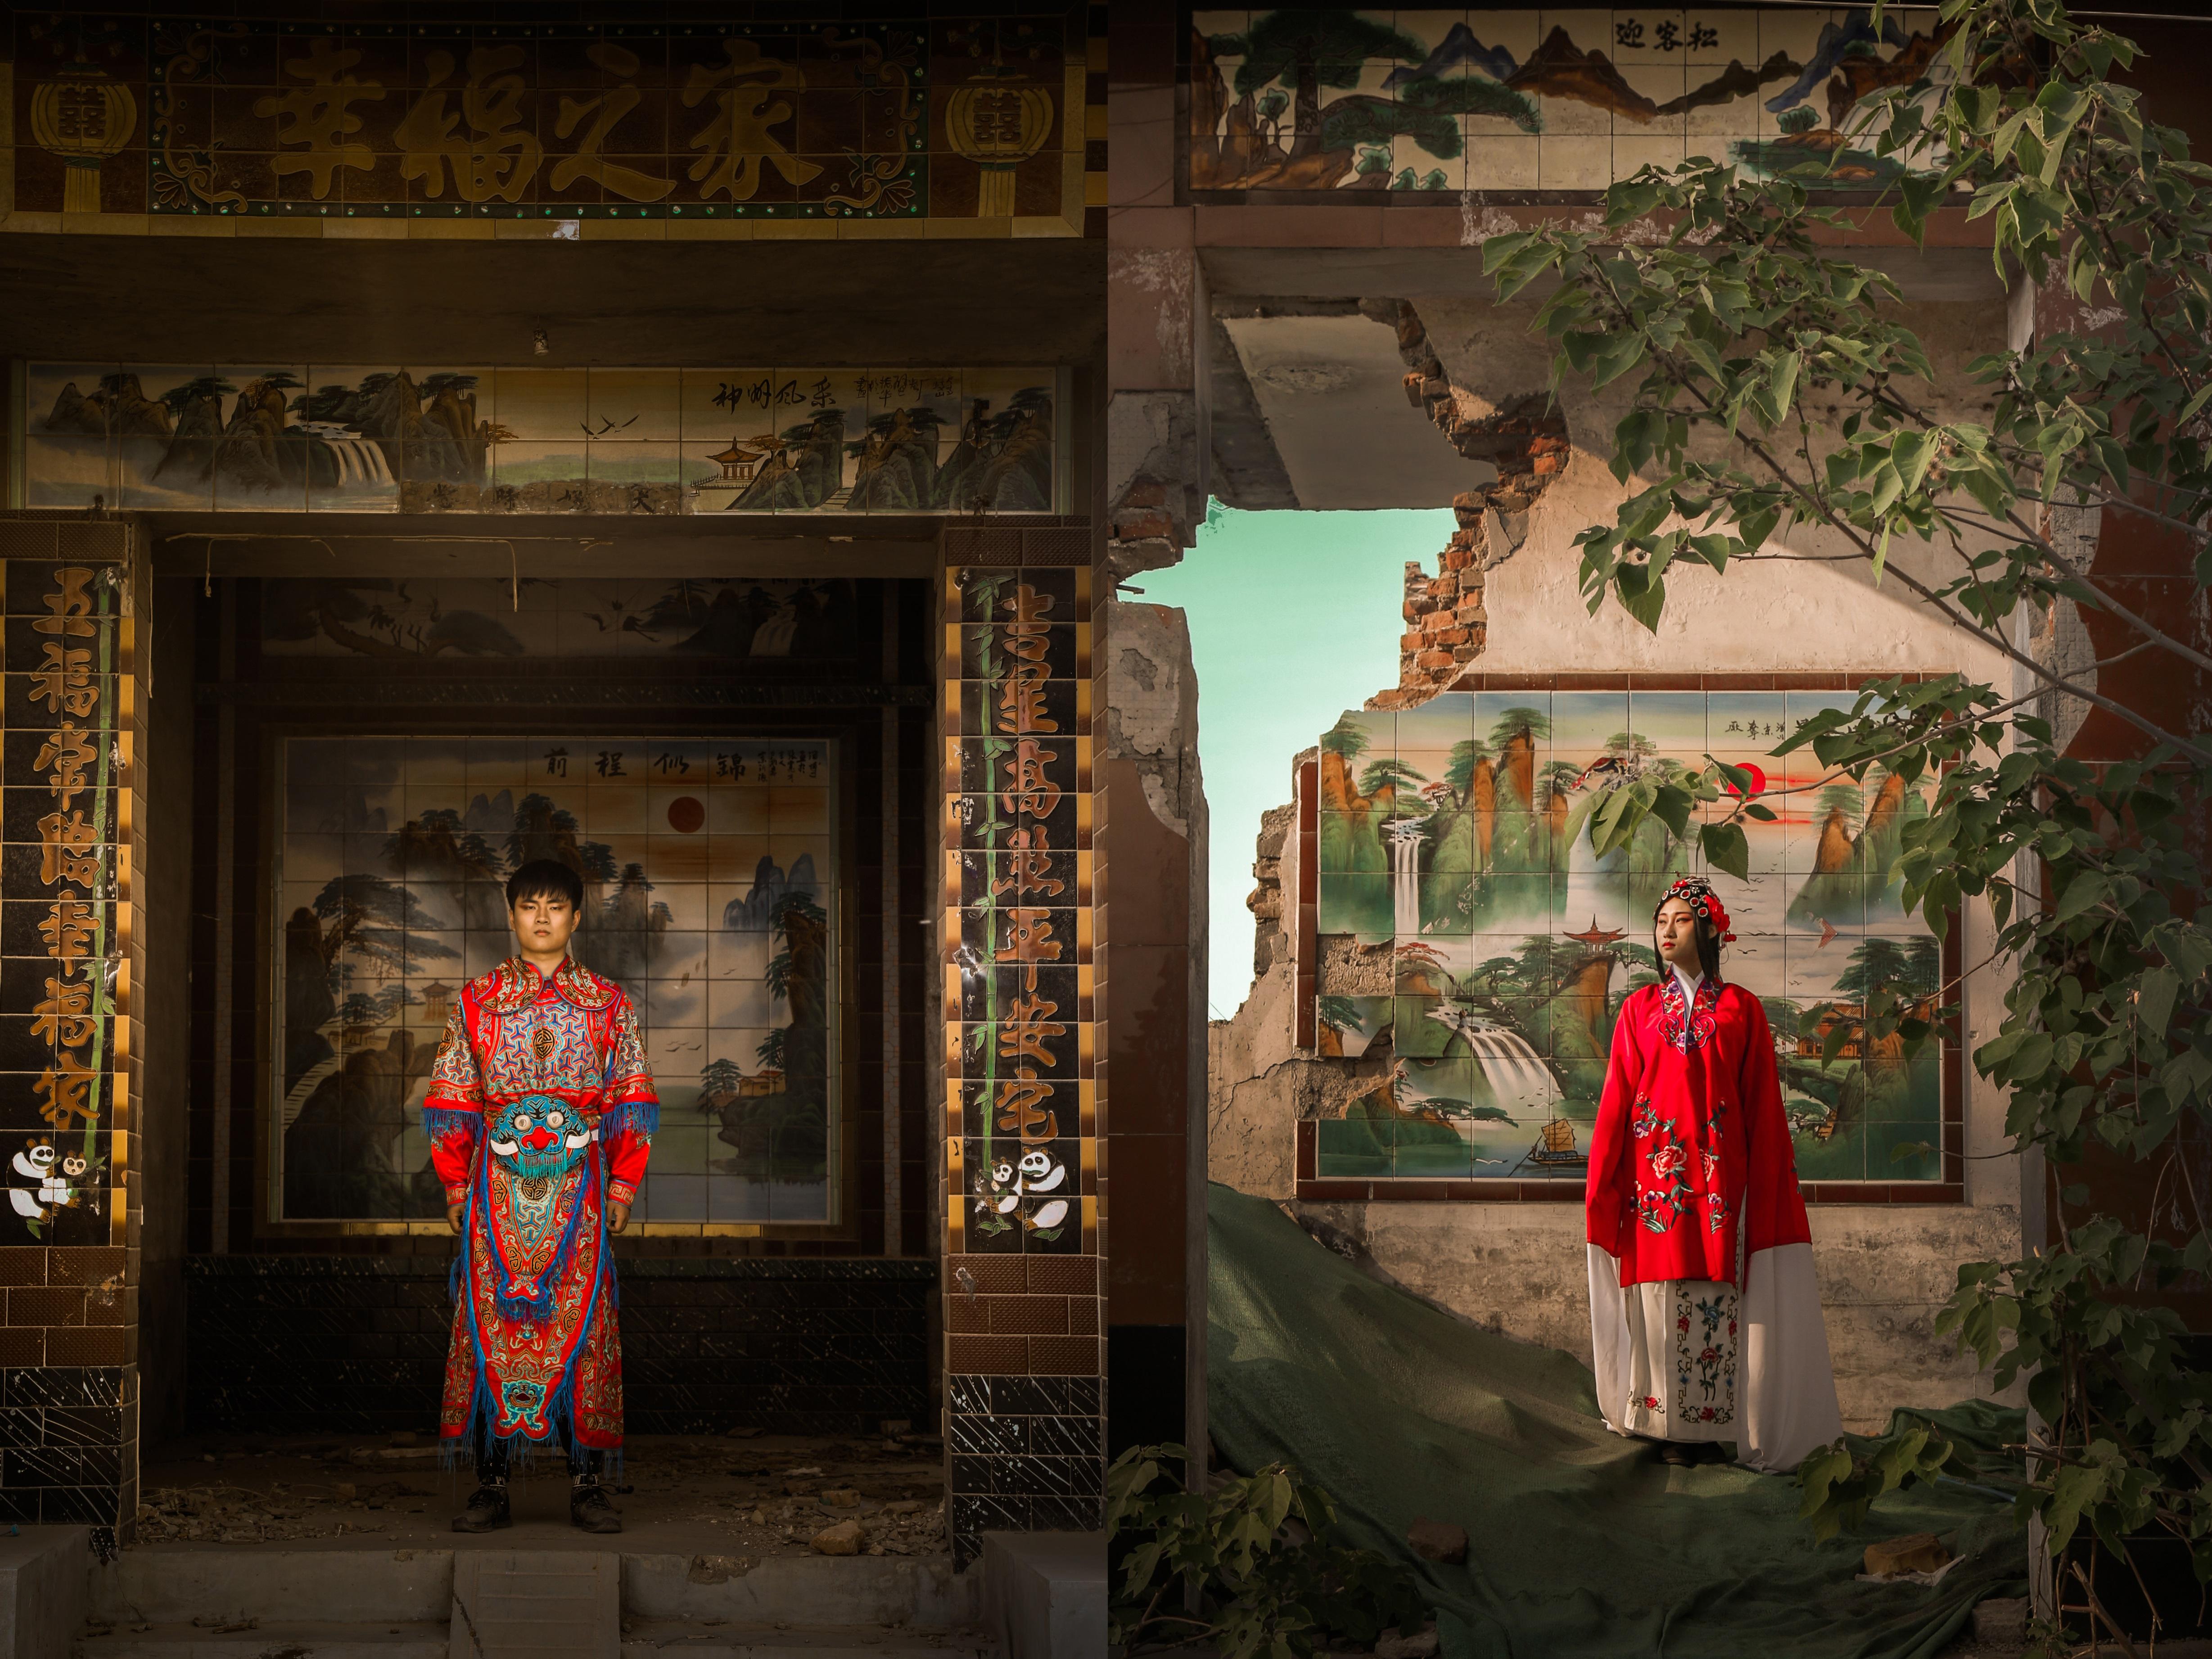 © Li Yanan, China Mainland, Student Shortlist, Sony World Photography Awards 2021